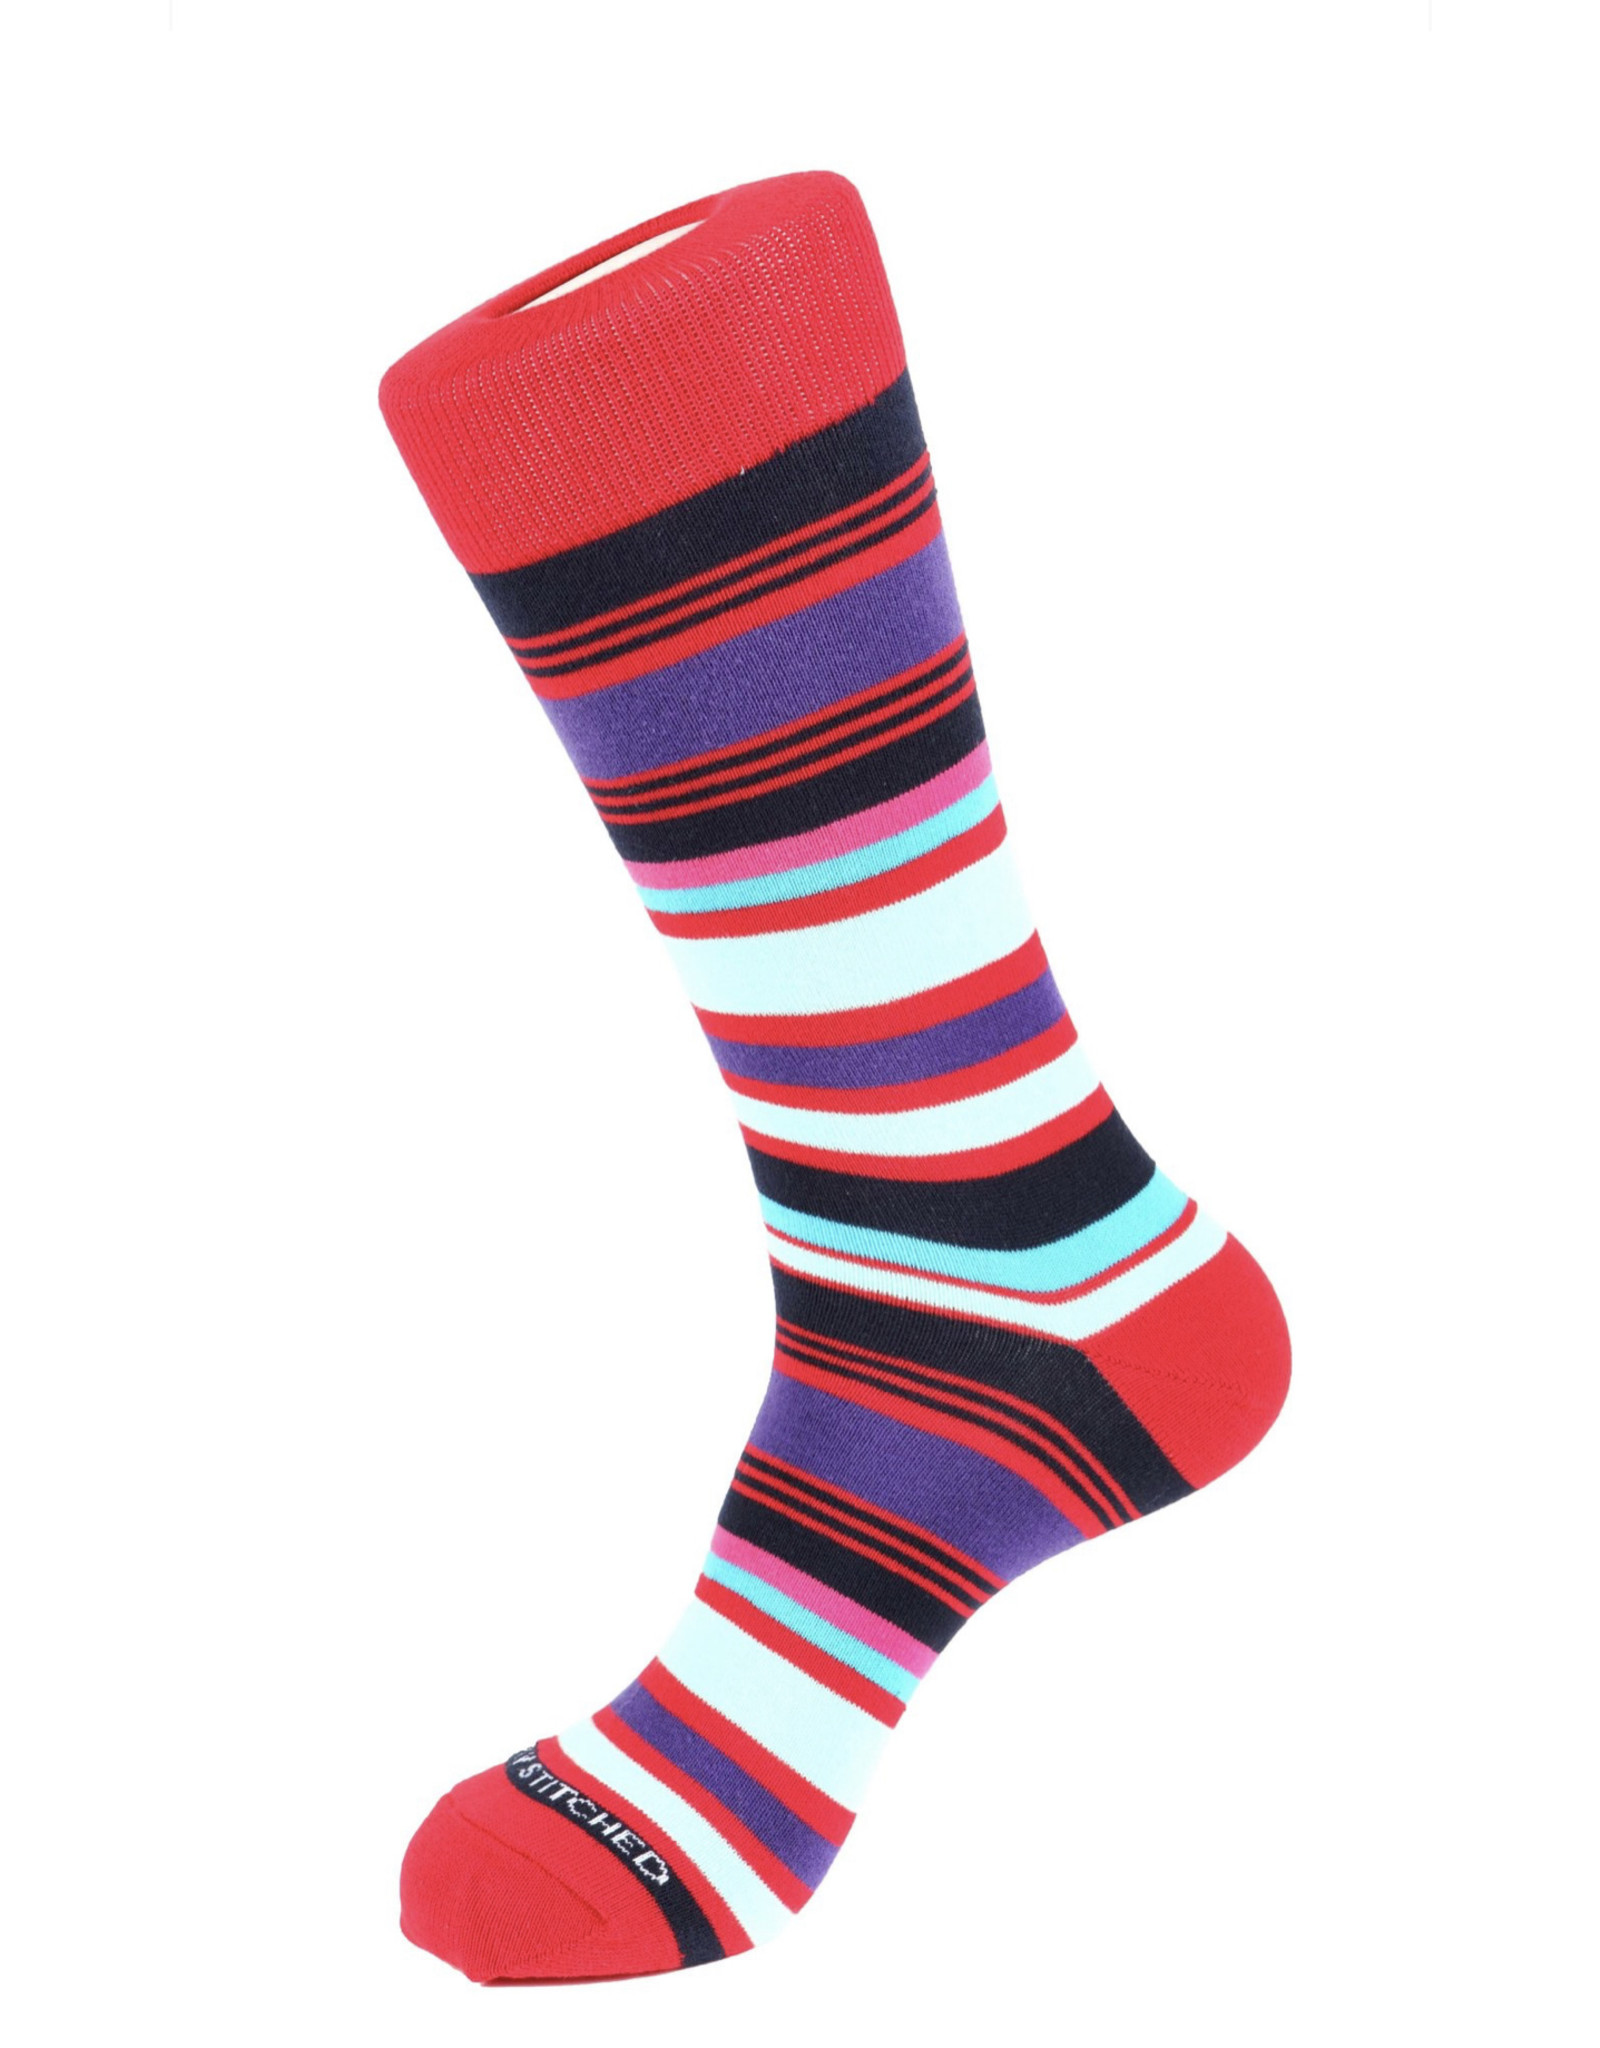 Unsimply Stitched Unsimply Stitched Men's Elegant Stripe Socks